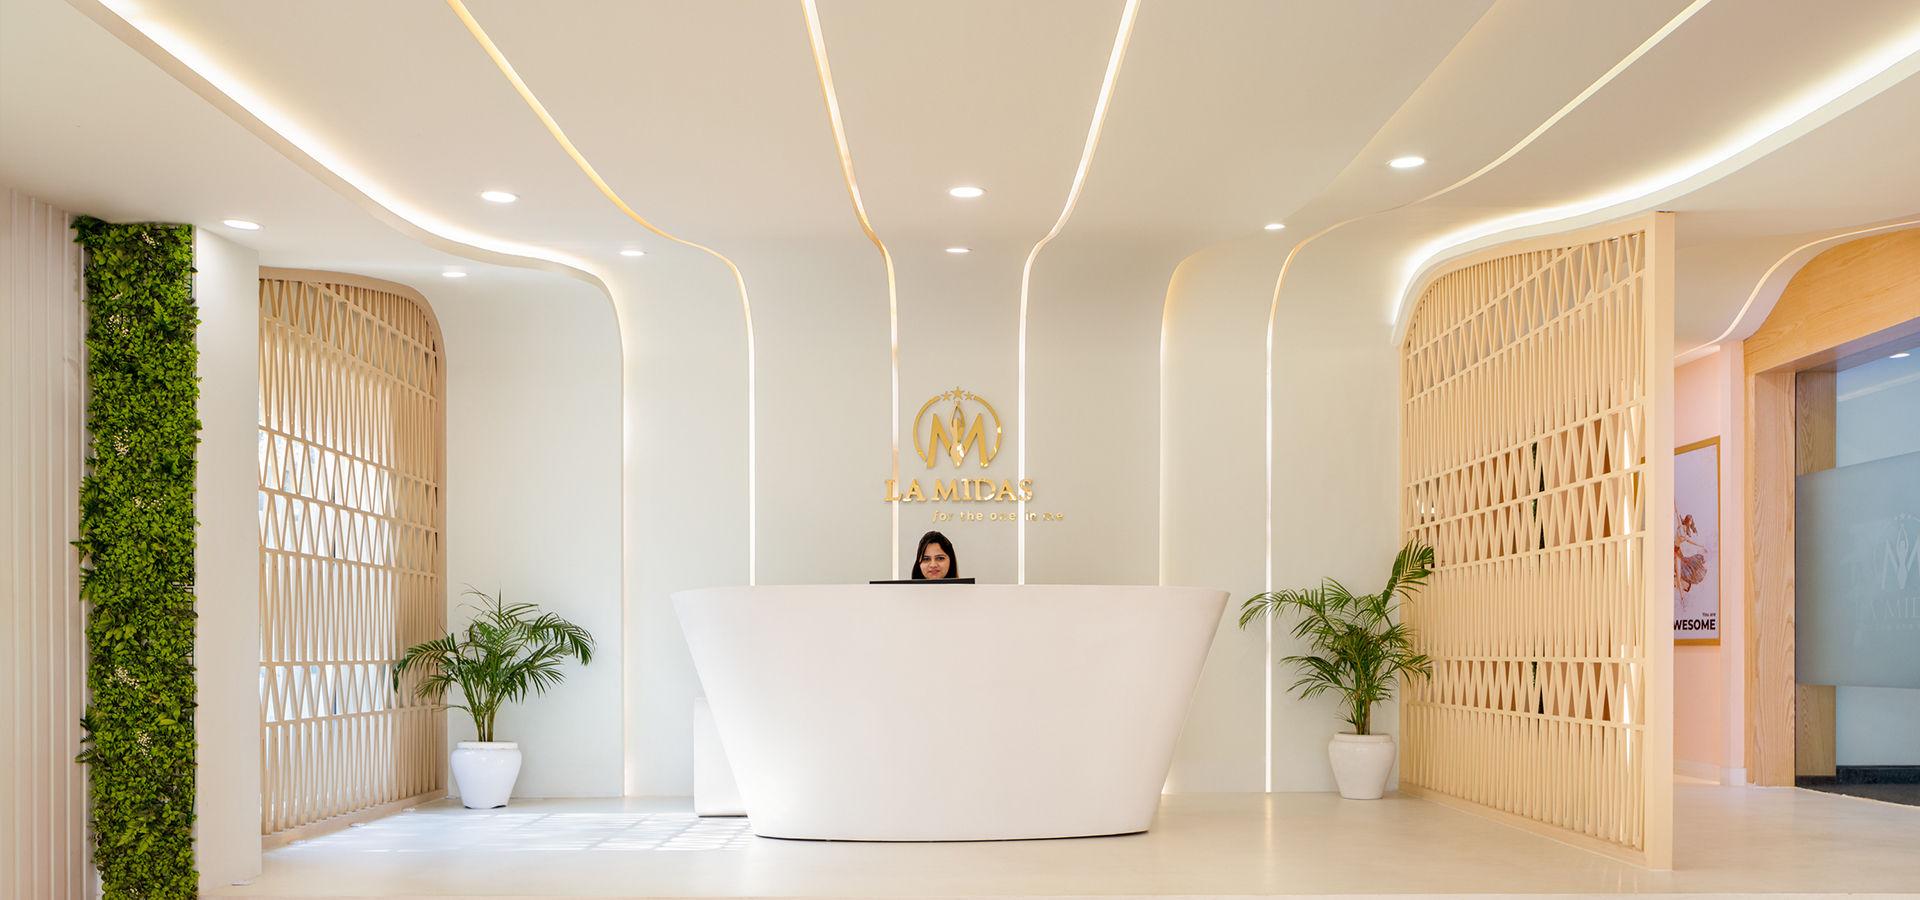 La Midas Wellness Centre